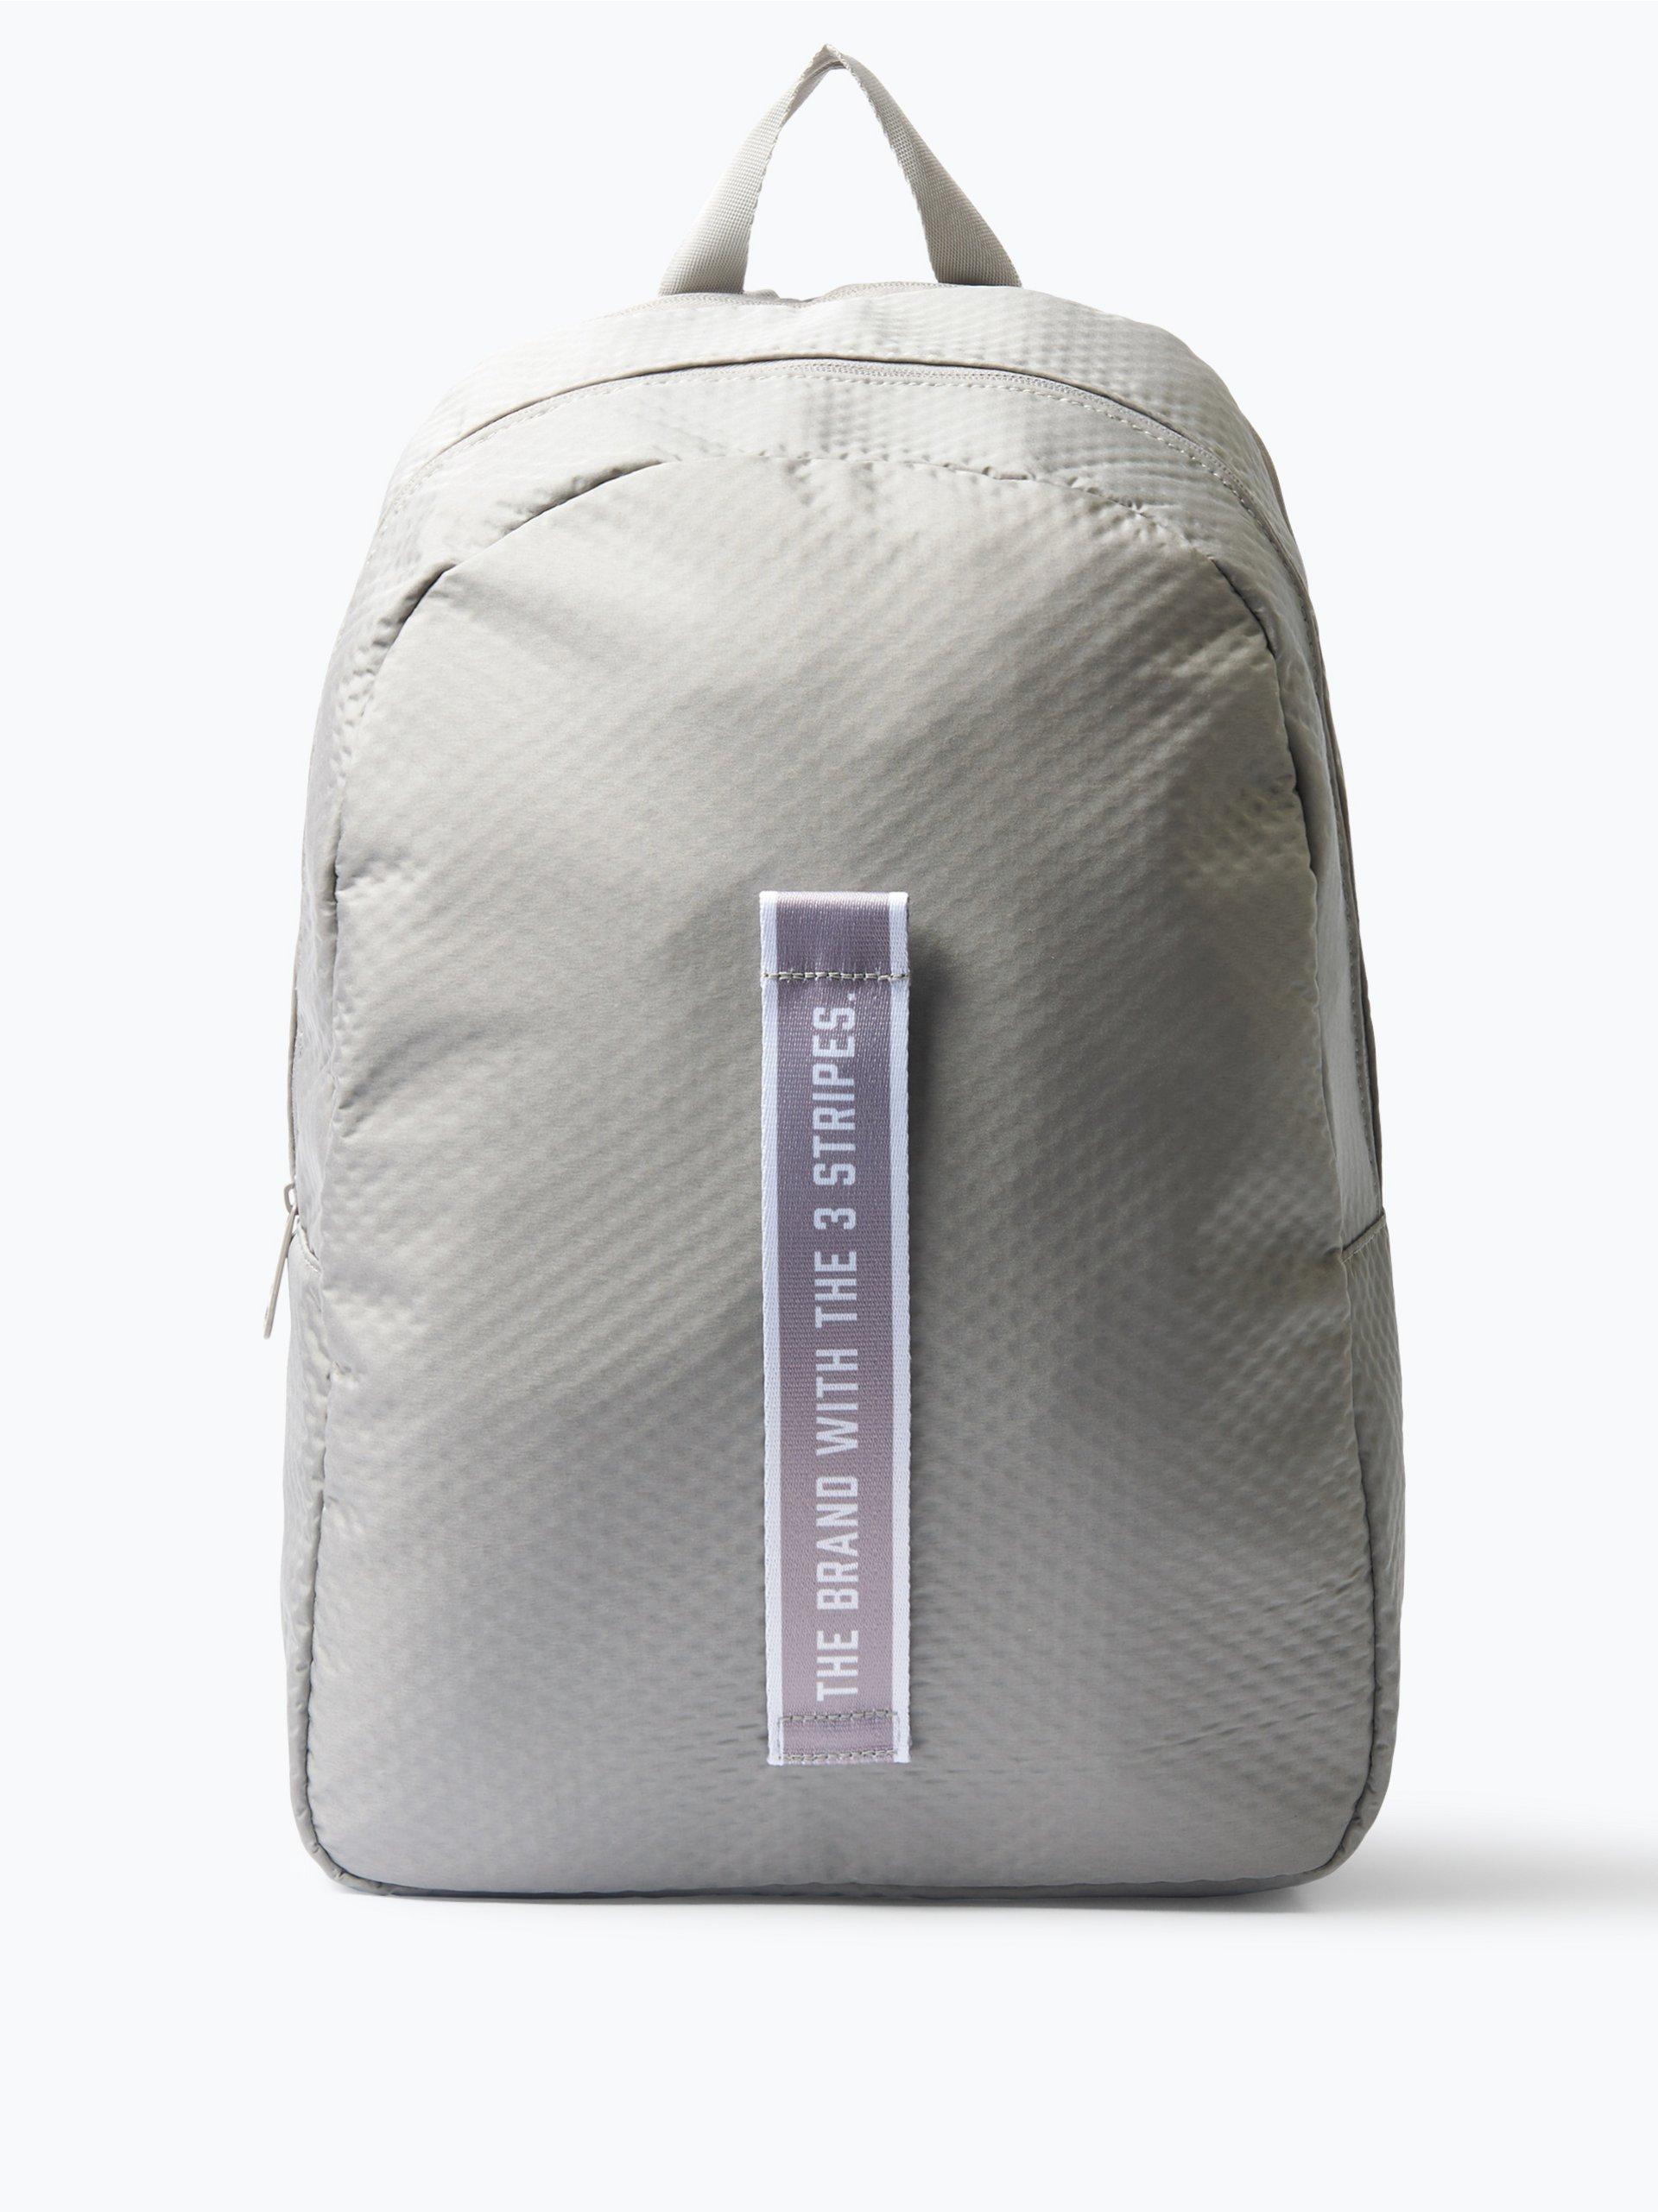 adidas originals damen rucksack grau uni online kaufen. Black Bedroom Furniture Sets. Home Design Ideas